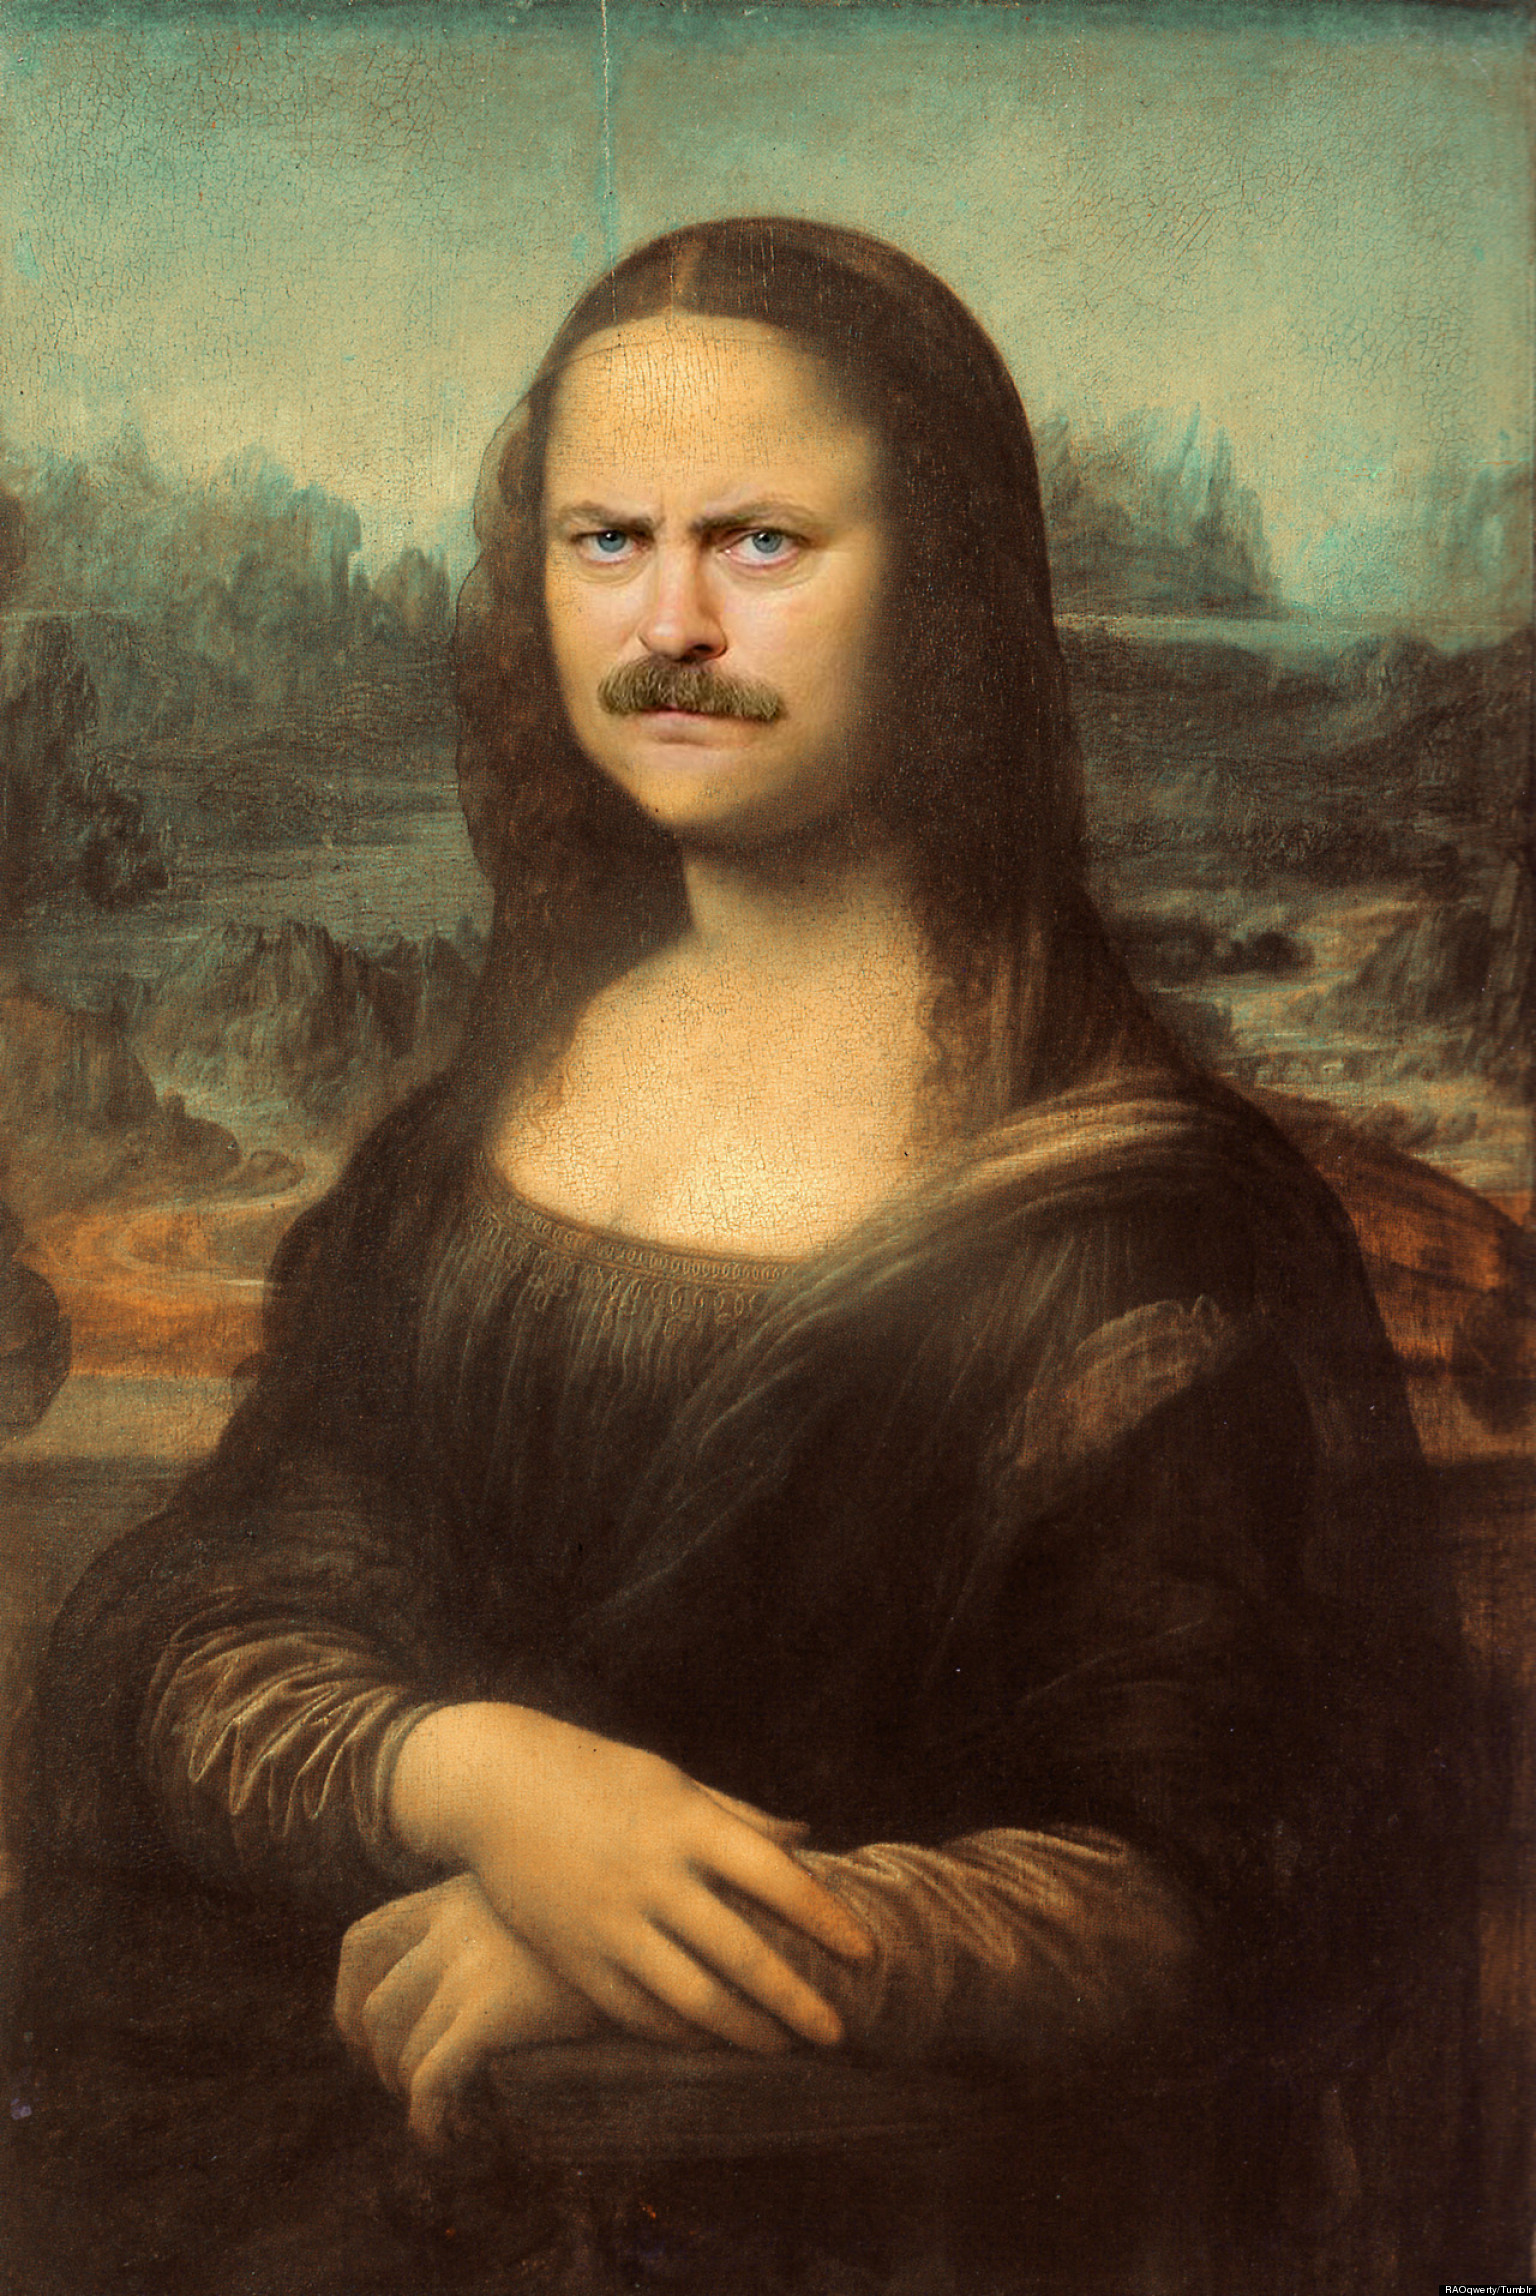 Ron Swanson Mona Lisa: A Hilarious Pop Culture Mashup That ... Da Vinci Mona Lisa